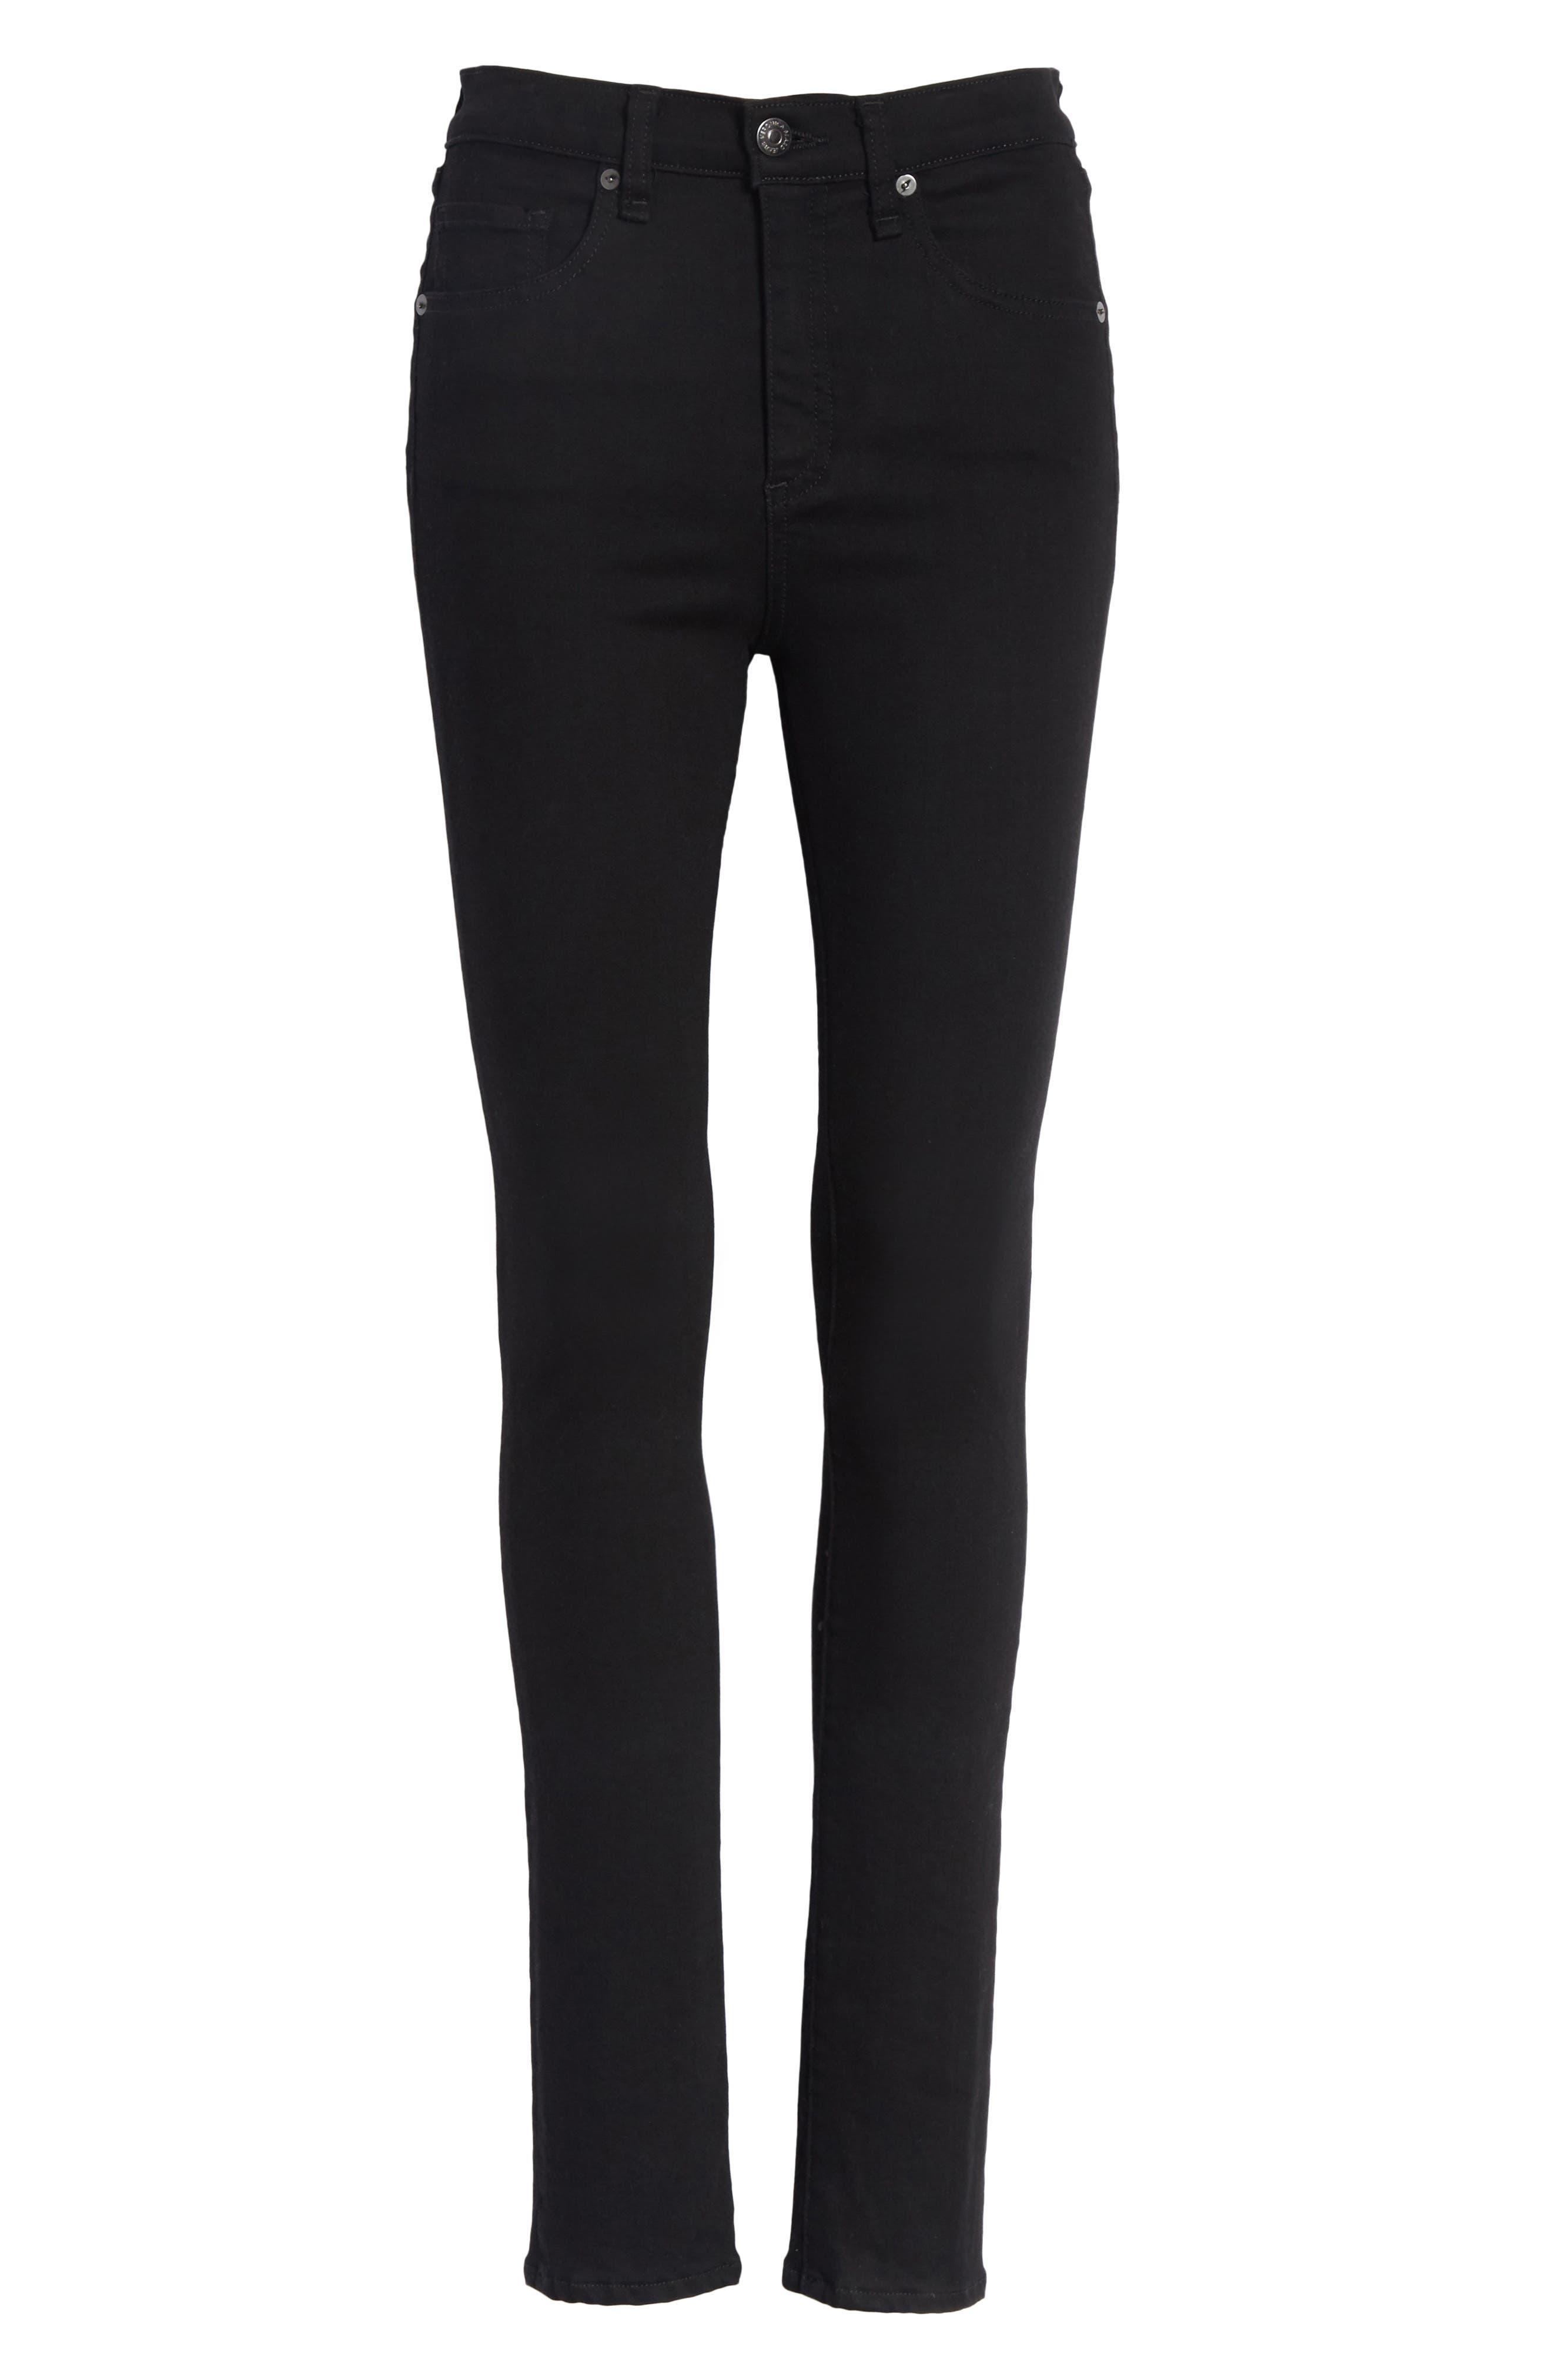 Kate 10 Skinny Jeans,                             Alternate thumbnail 6, color,                             RAVEN